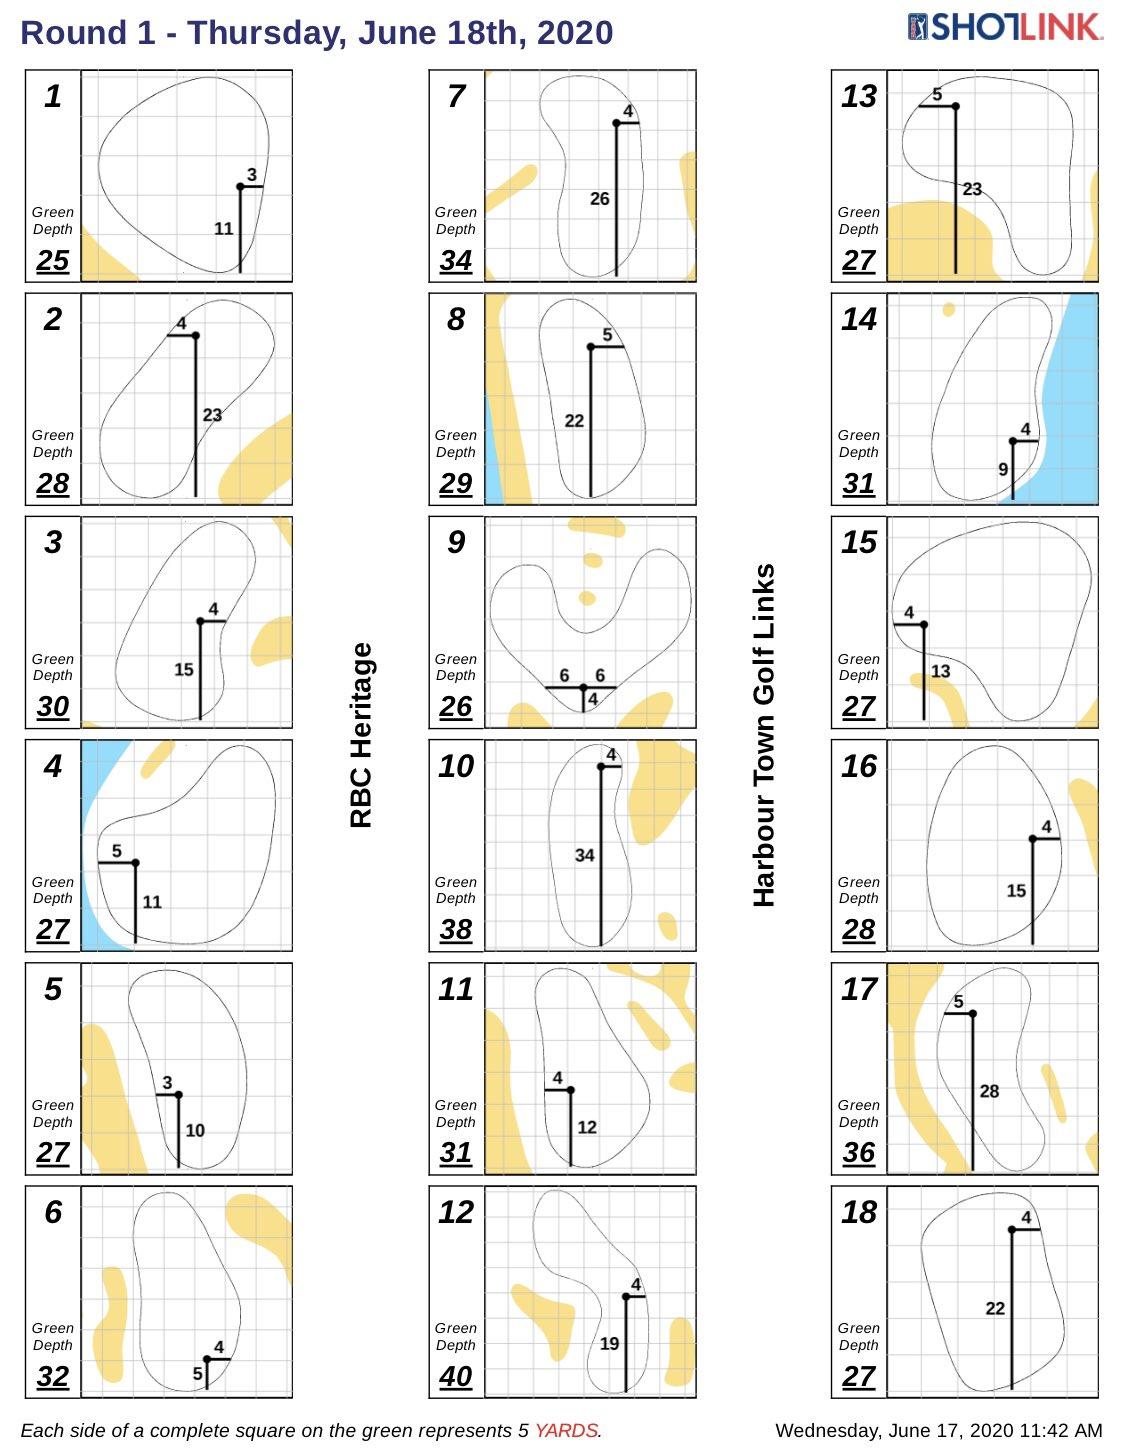 PGA TOUR 2020 - RBC Heritage EawXCwlWkAANO_1?format=jpg&name=large